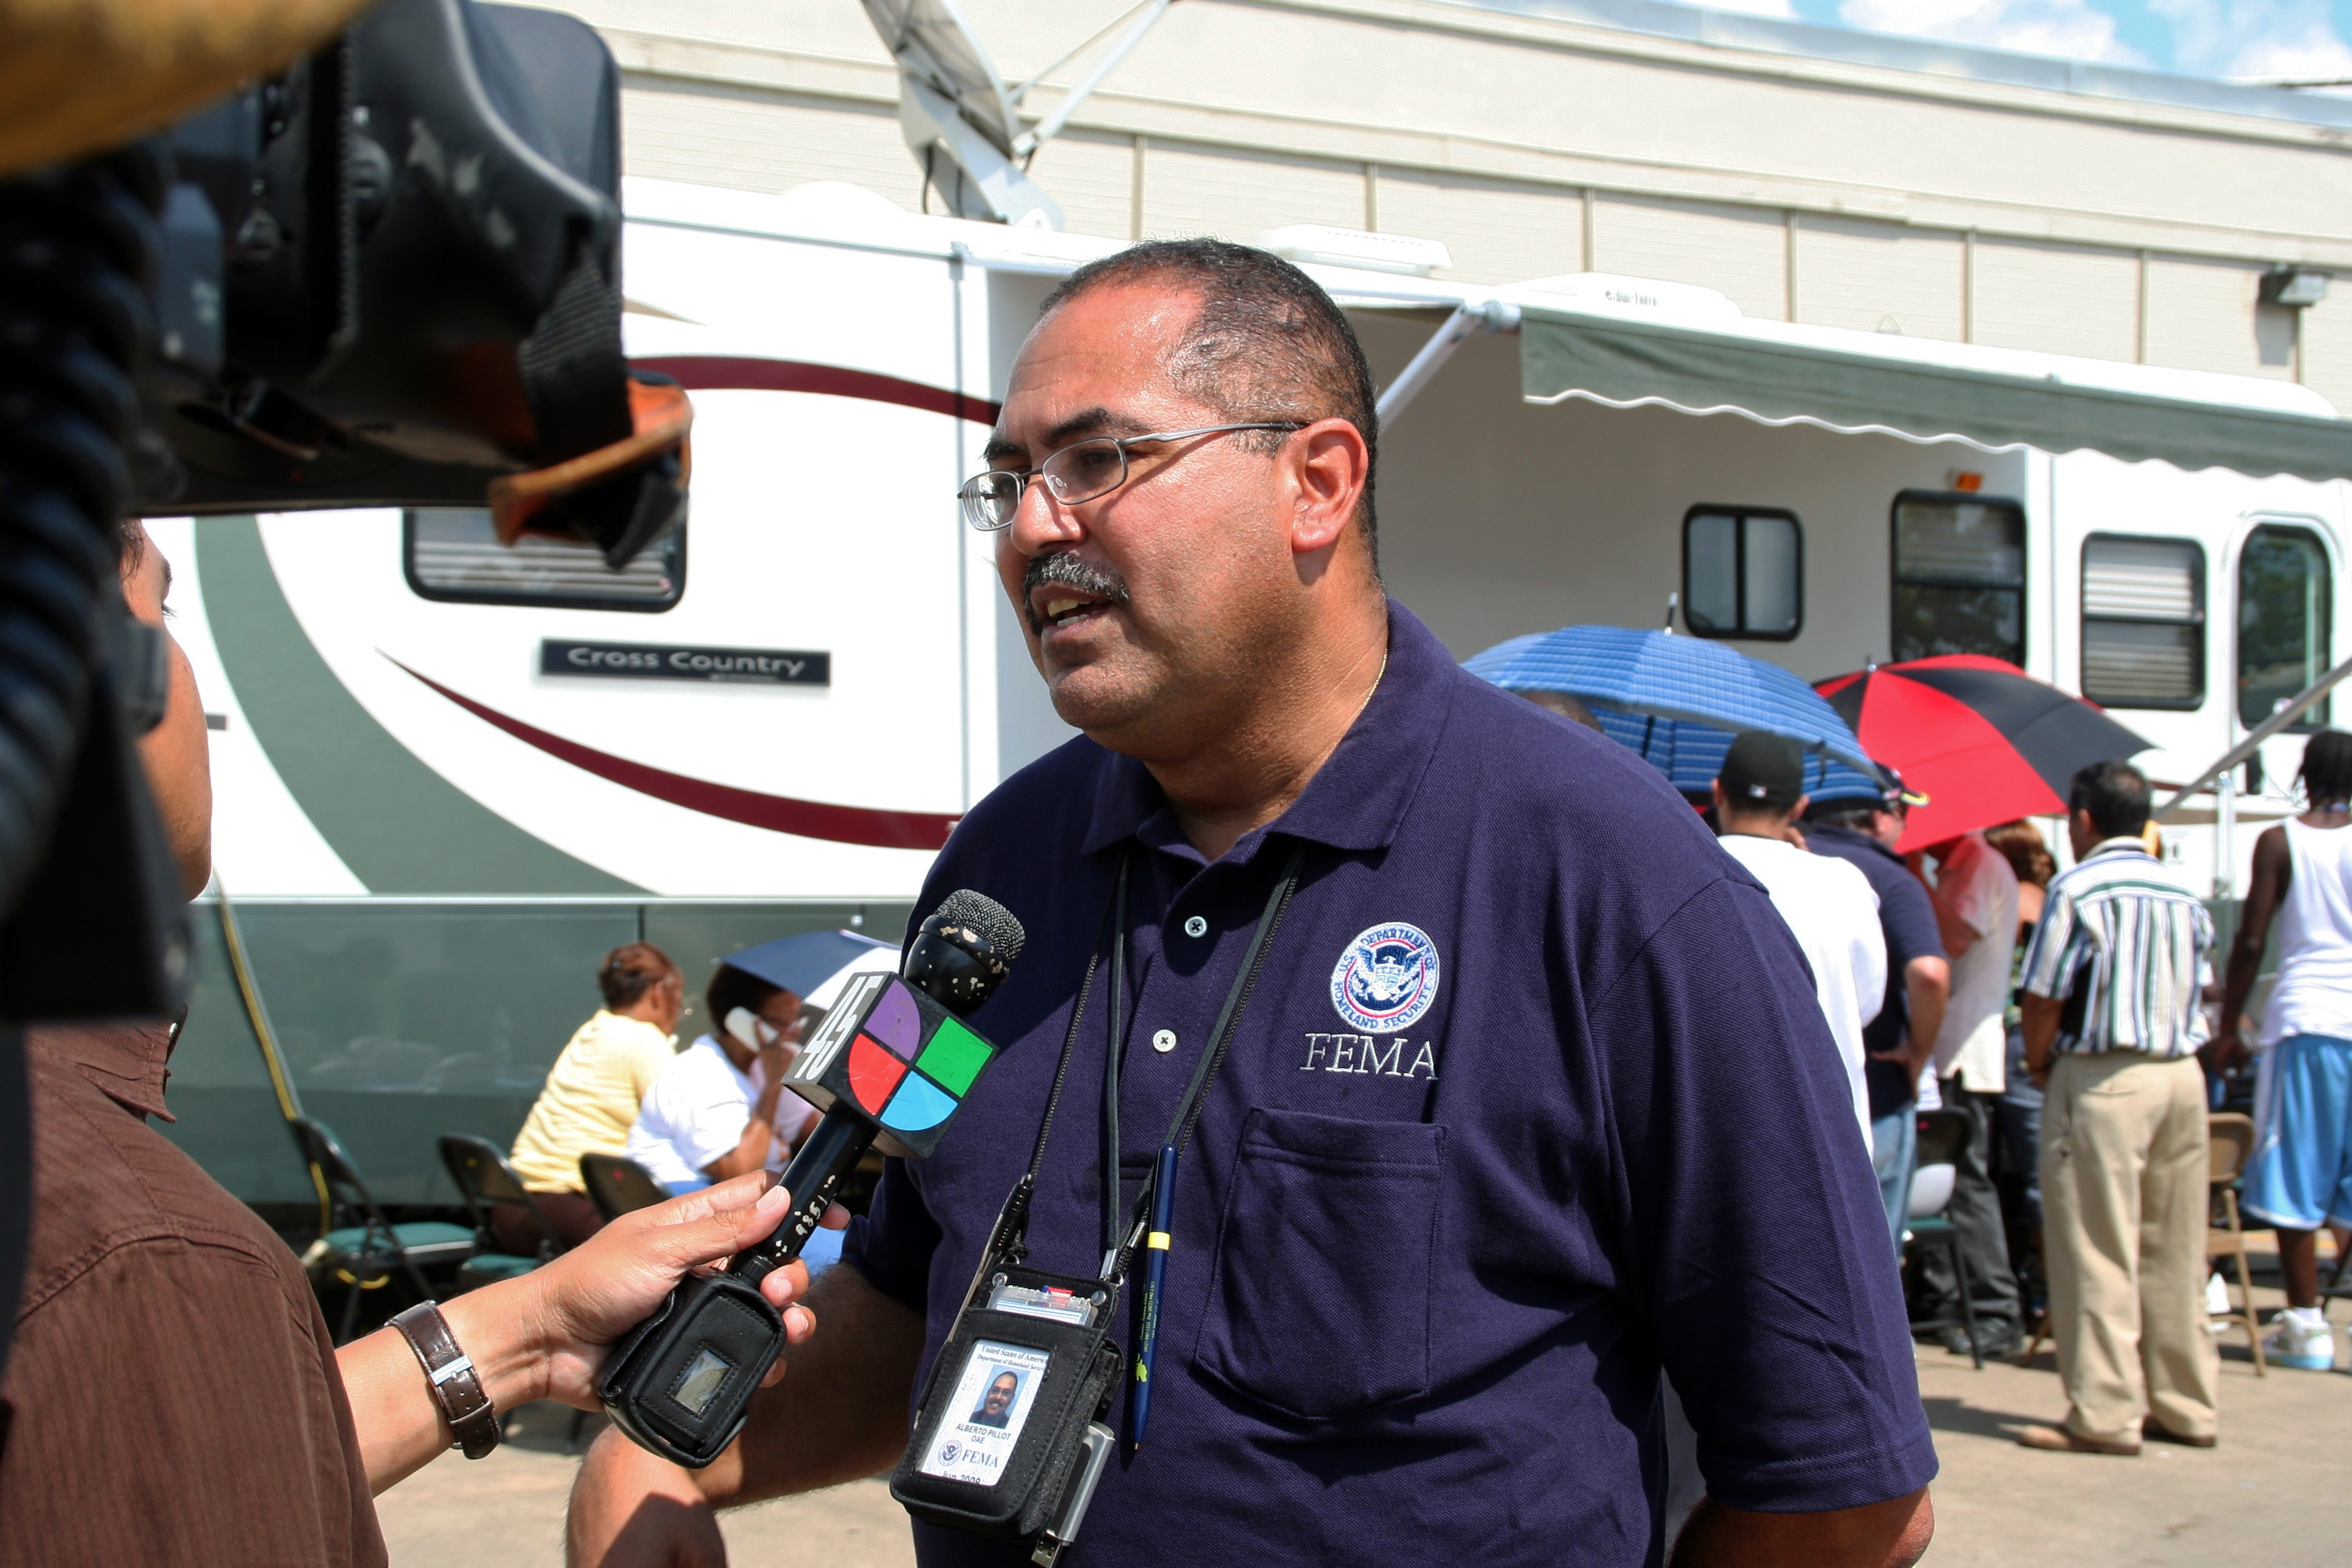 FEMA_-_38592_-_FEMA_PIO_speaking_with_the_Spanish_Language_Station_in_Texas.jpg